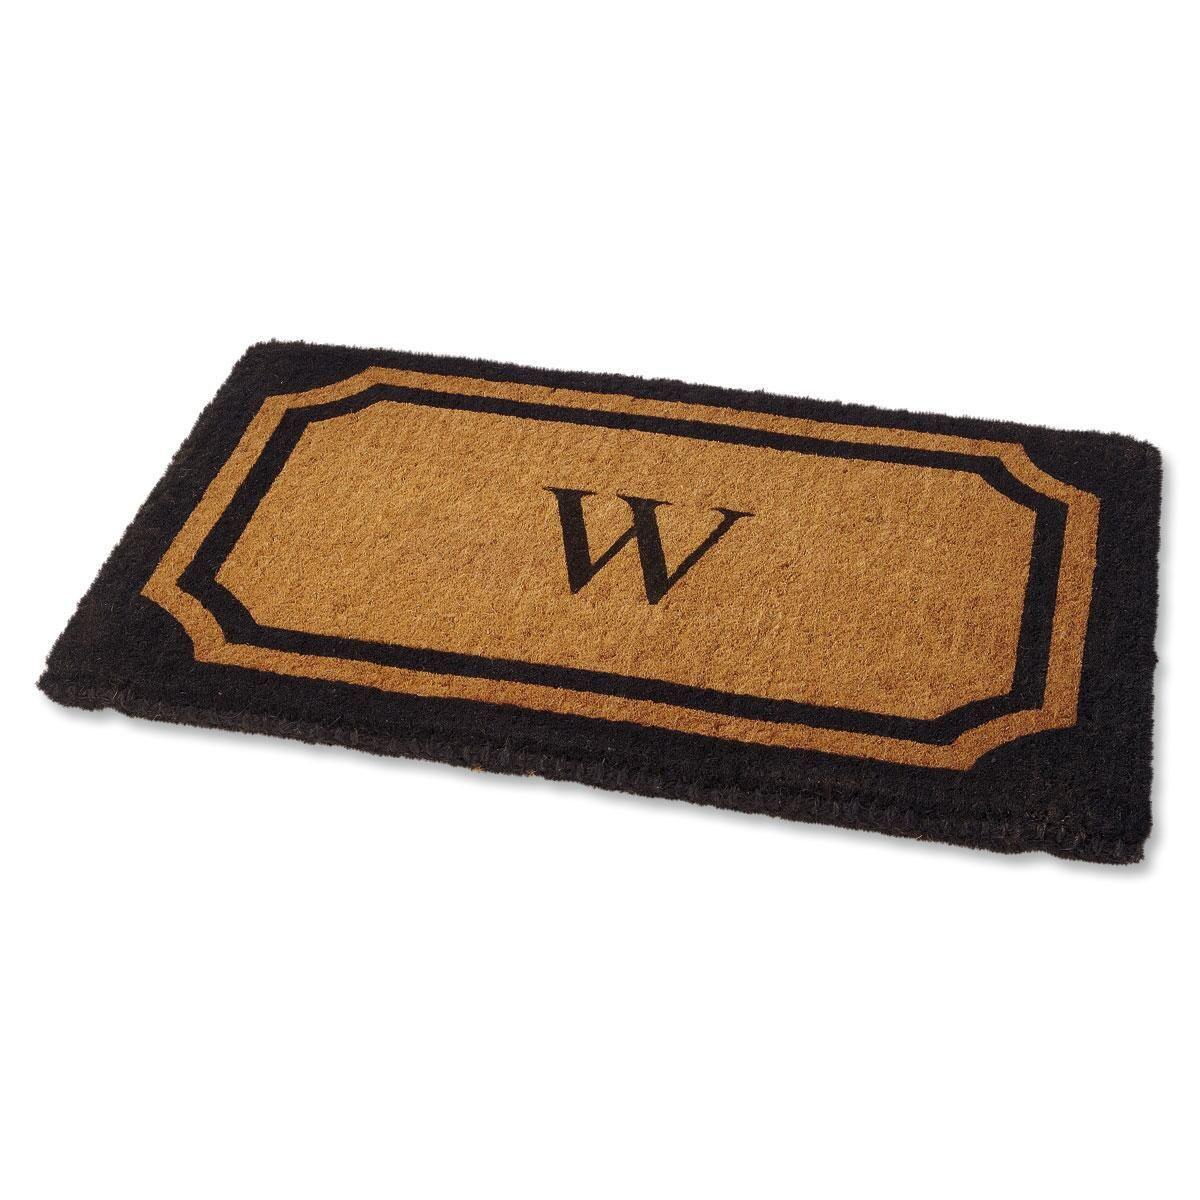 Imperial Wilkinson Personalized Doormat